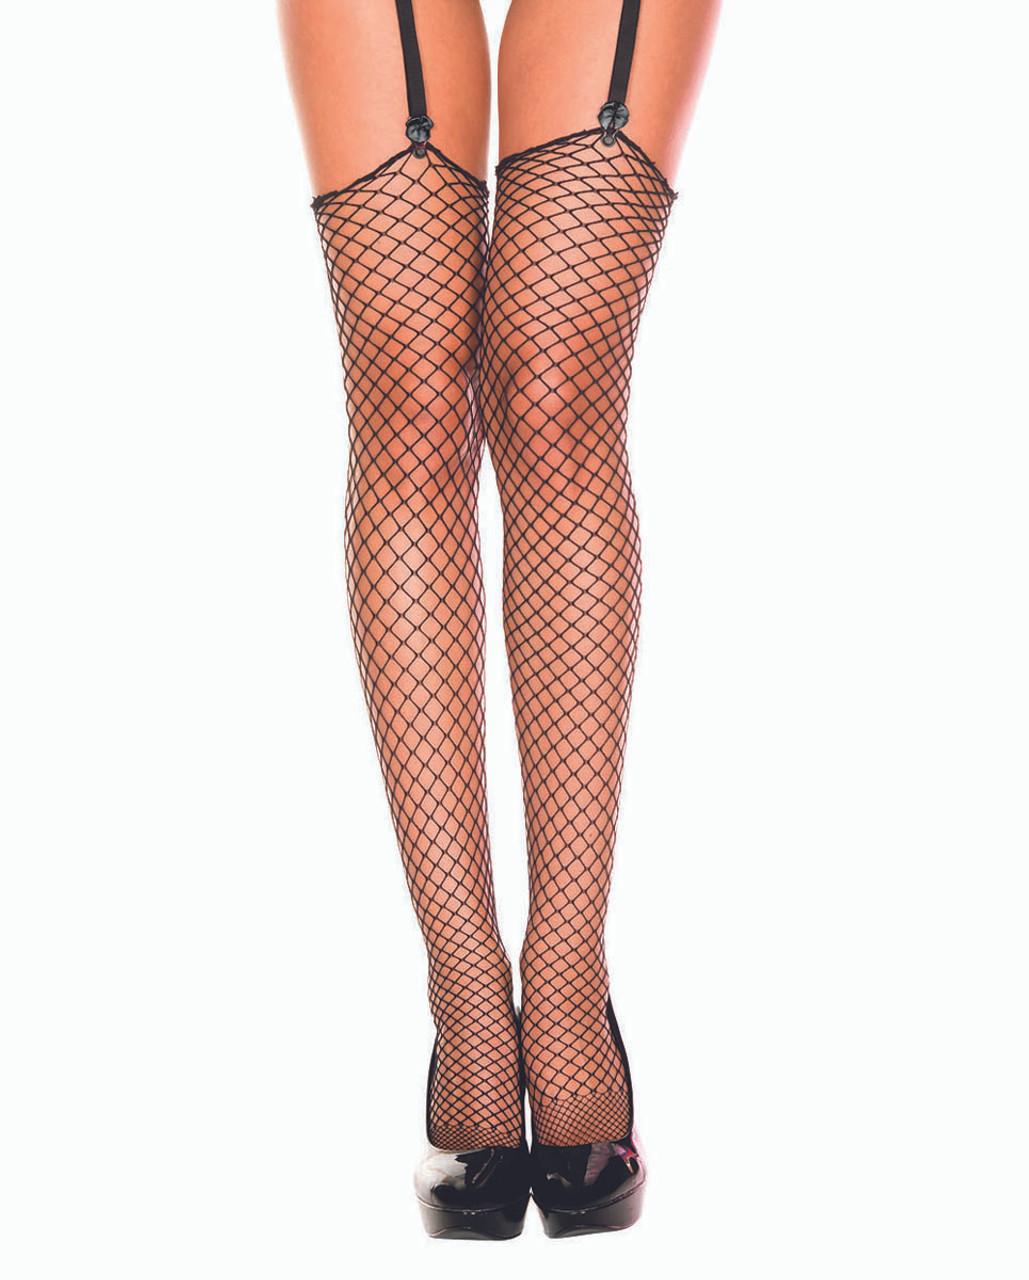 New Music Legs 4991Q Plus Size Fishnet Thigh High Stockings